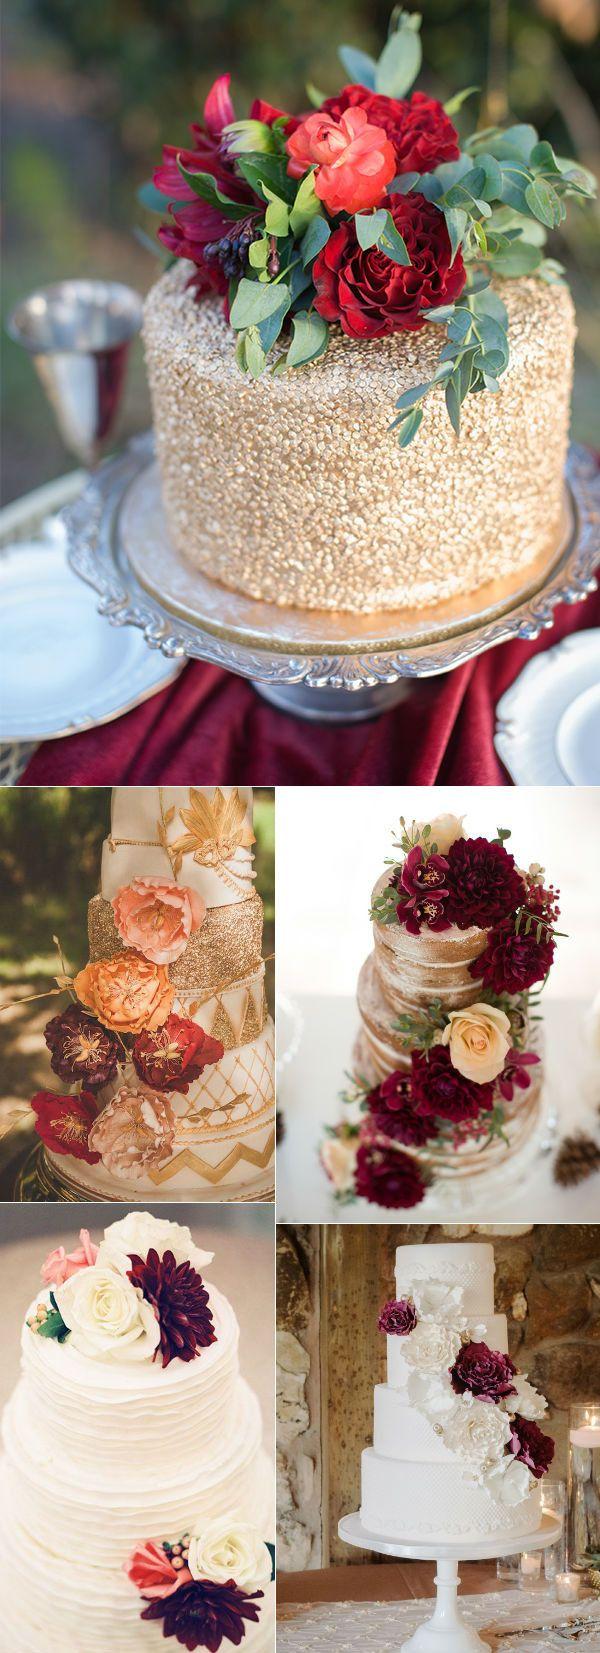 marsala fall wedding cake ideas